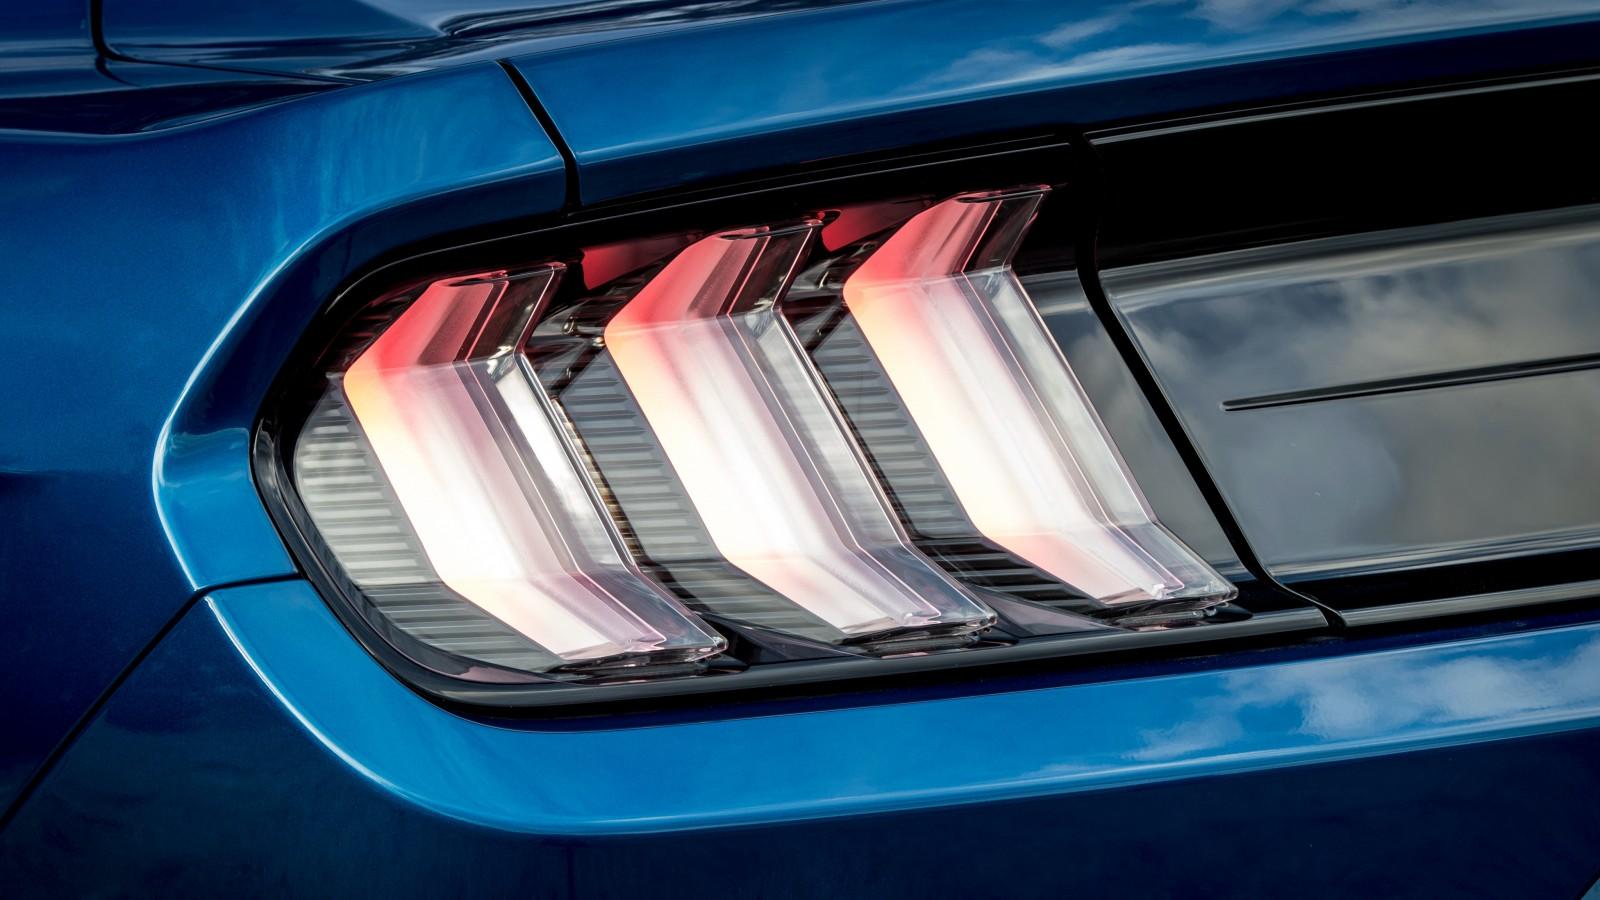 Audi Car Wallpaper Download Ford Mustang Led Tail Lights 4k Wallpaper Hd Car